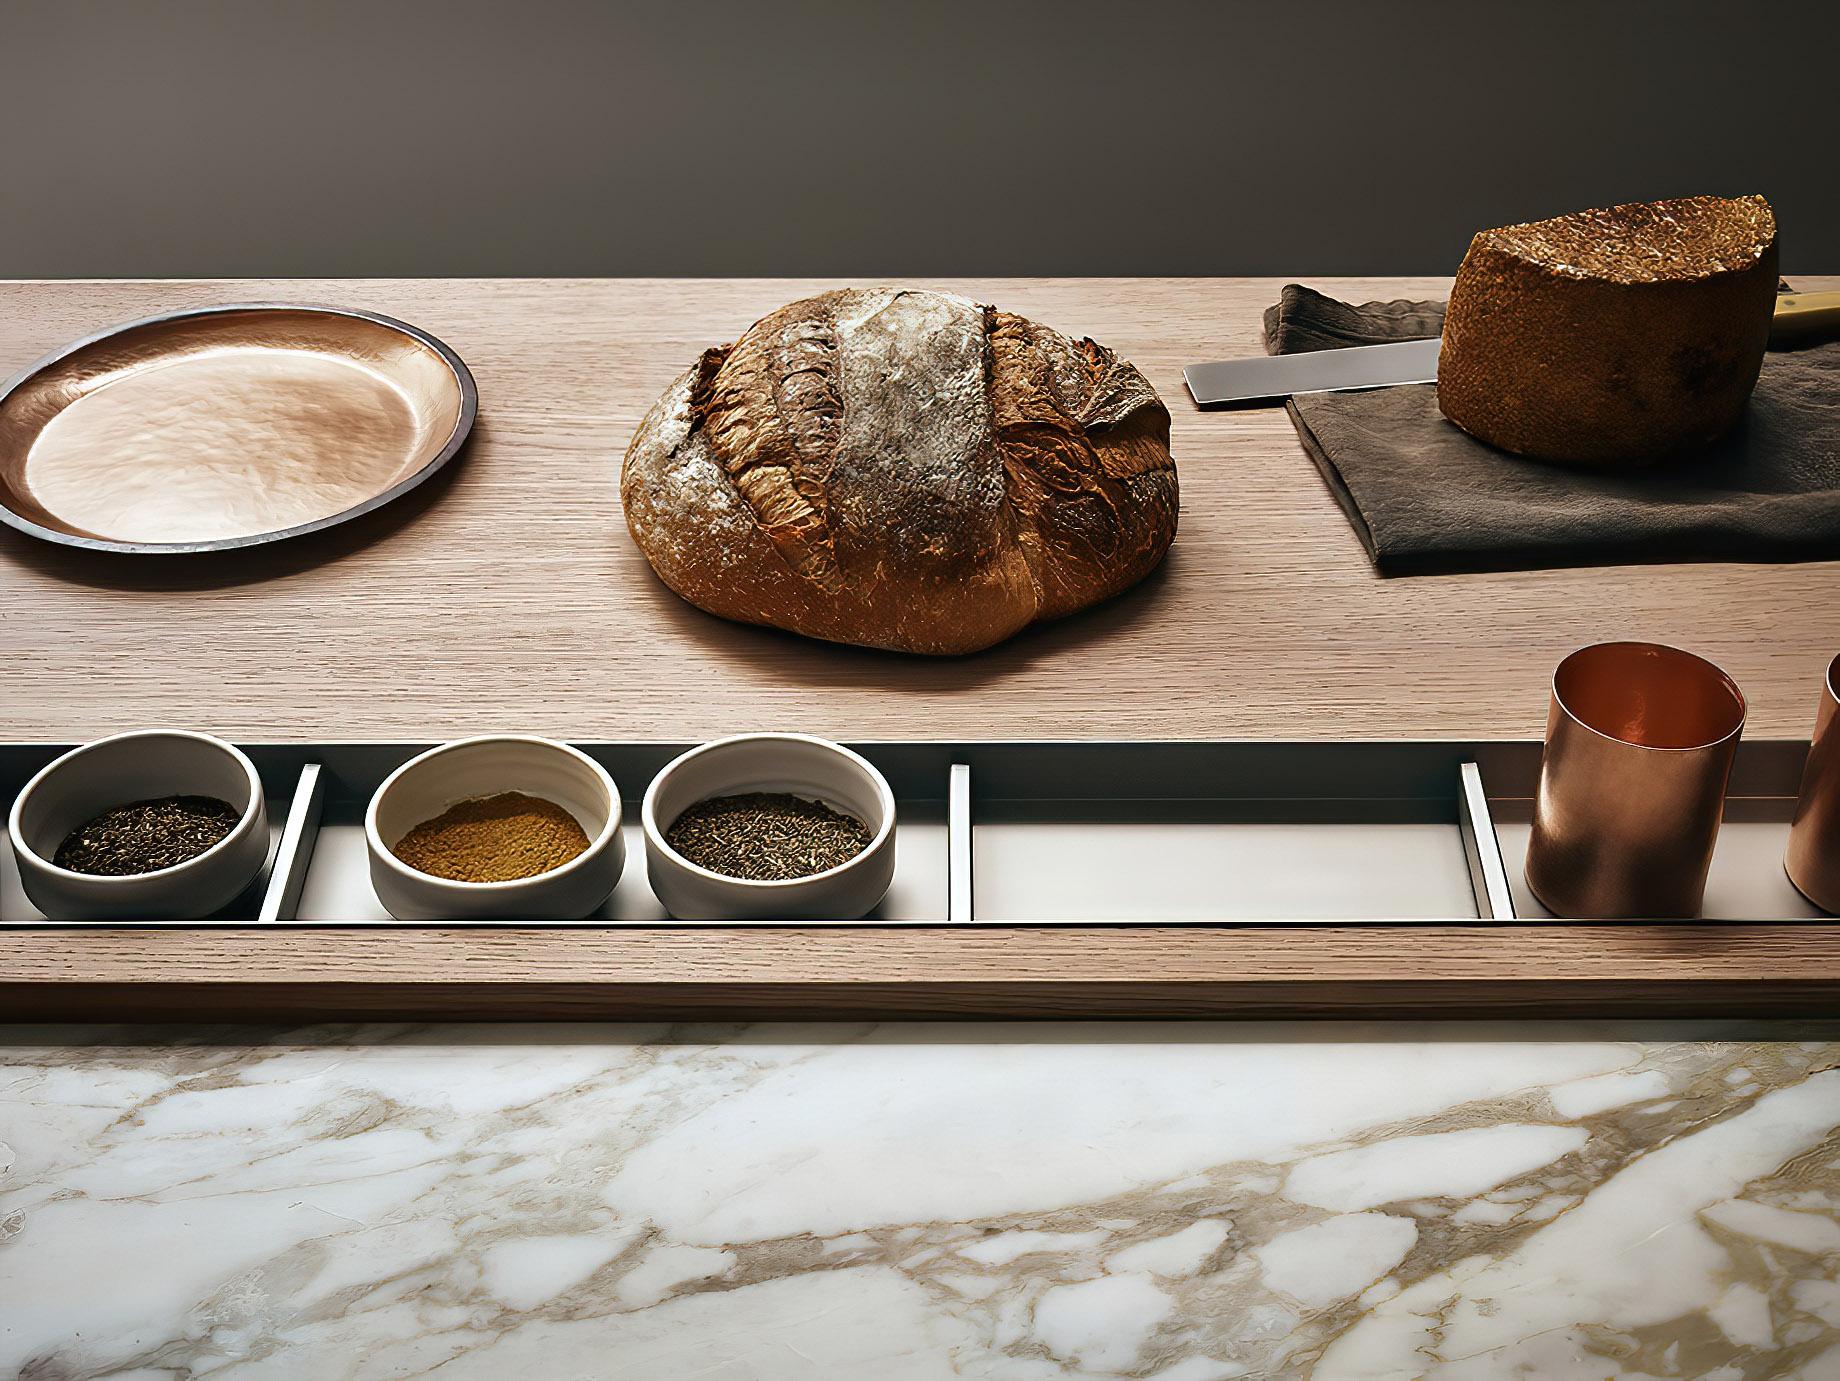 K-lab Contemporary Kitchen Ernestomeda Italy – Giuseppe Bavuso – Cook Chopping Board